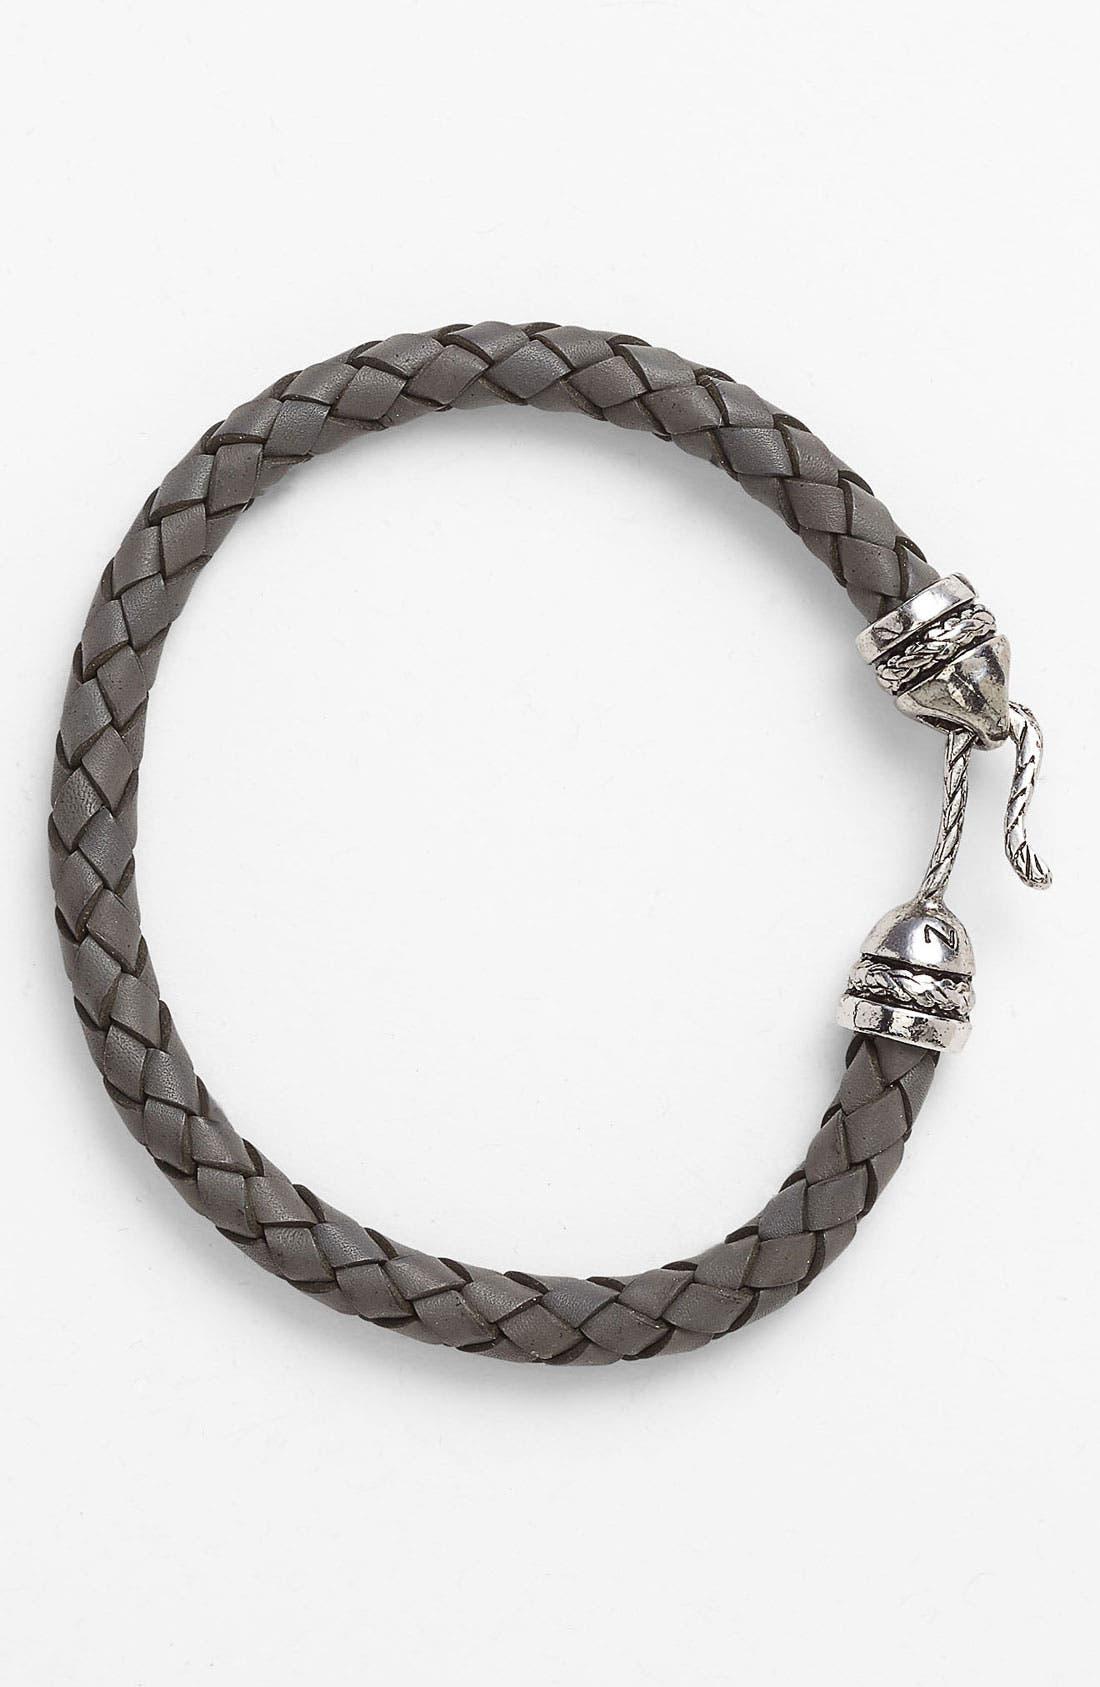 Alternate Image 1 Selected - Zack Woven Leather Bracelet